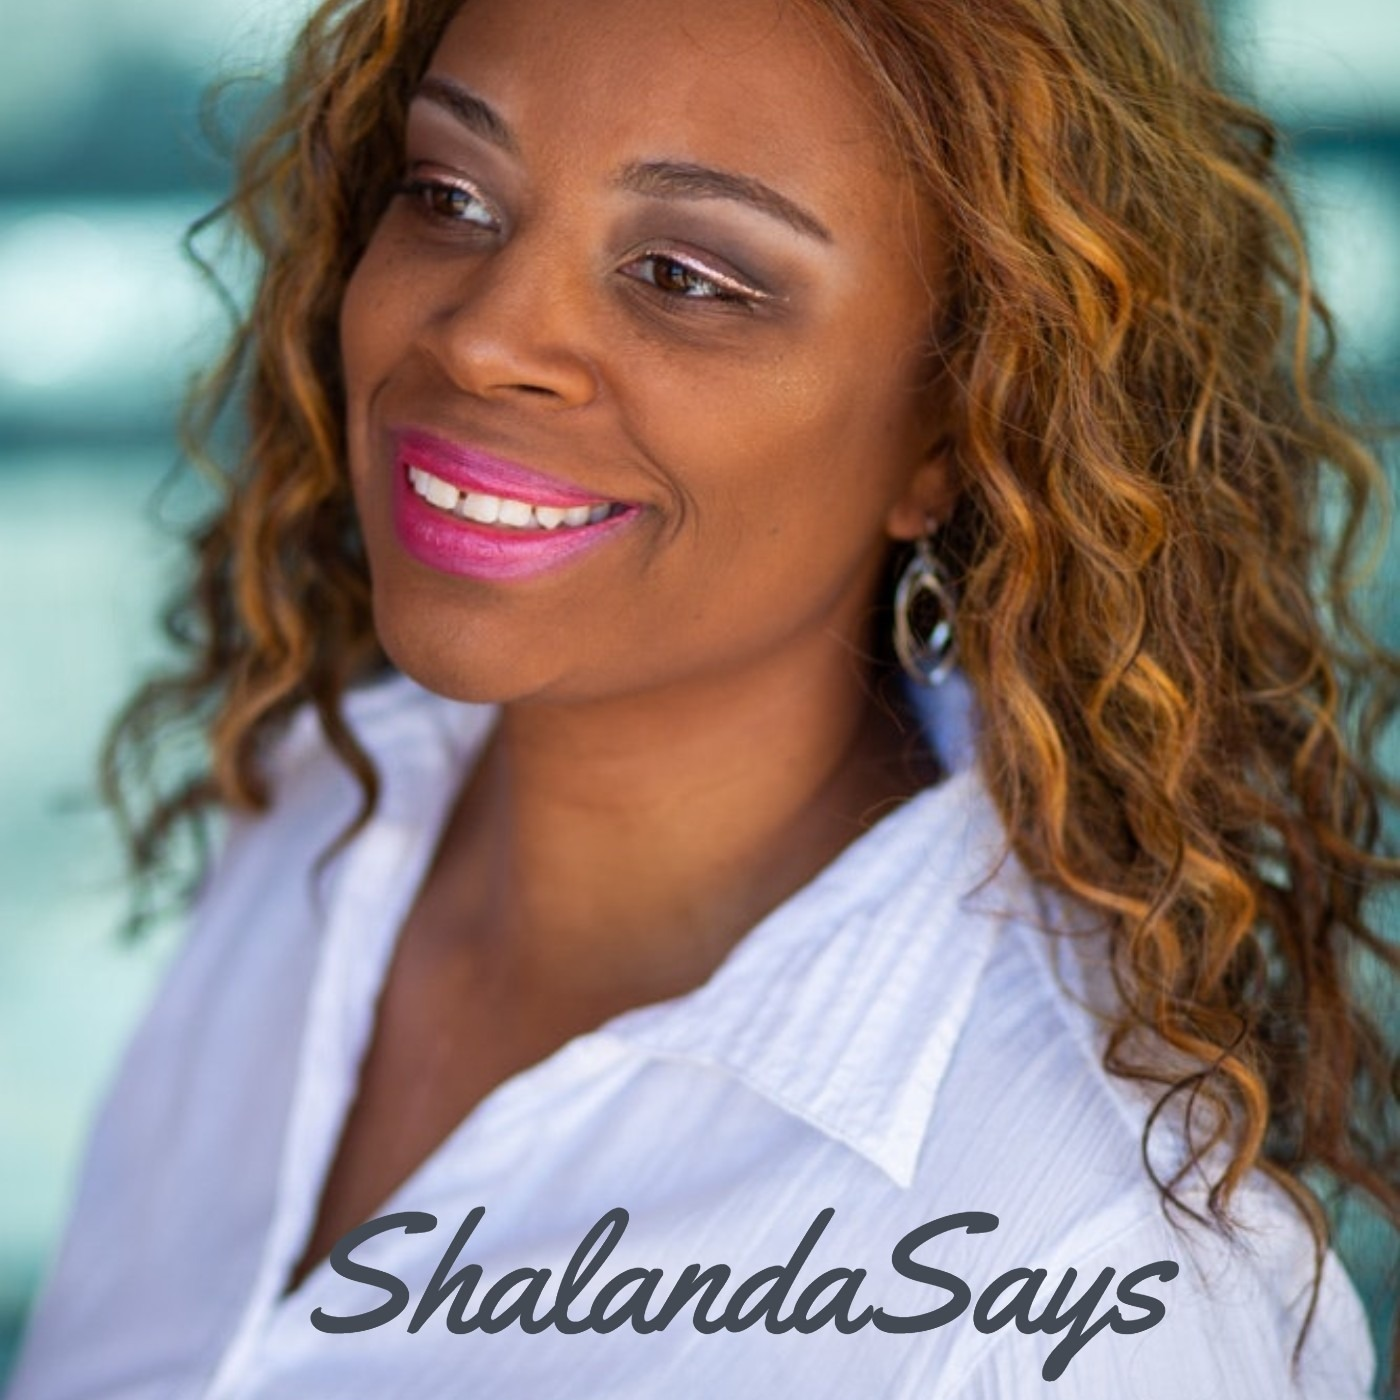 ShalandaSays Meet Organizational Strategist Ron Carucci